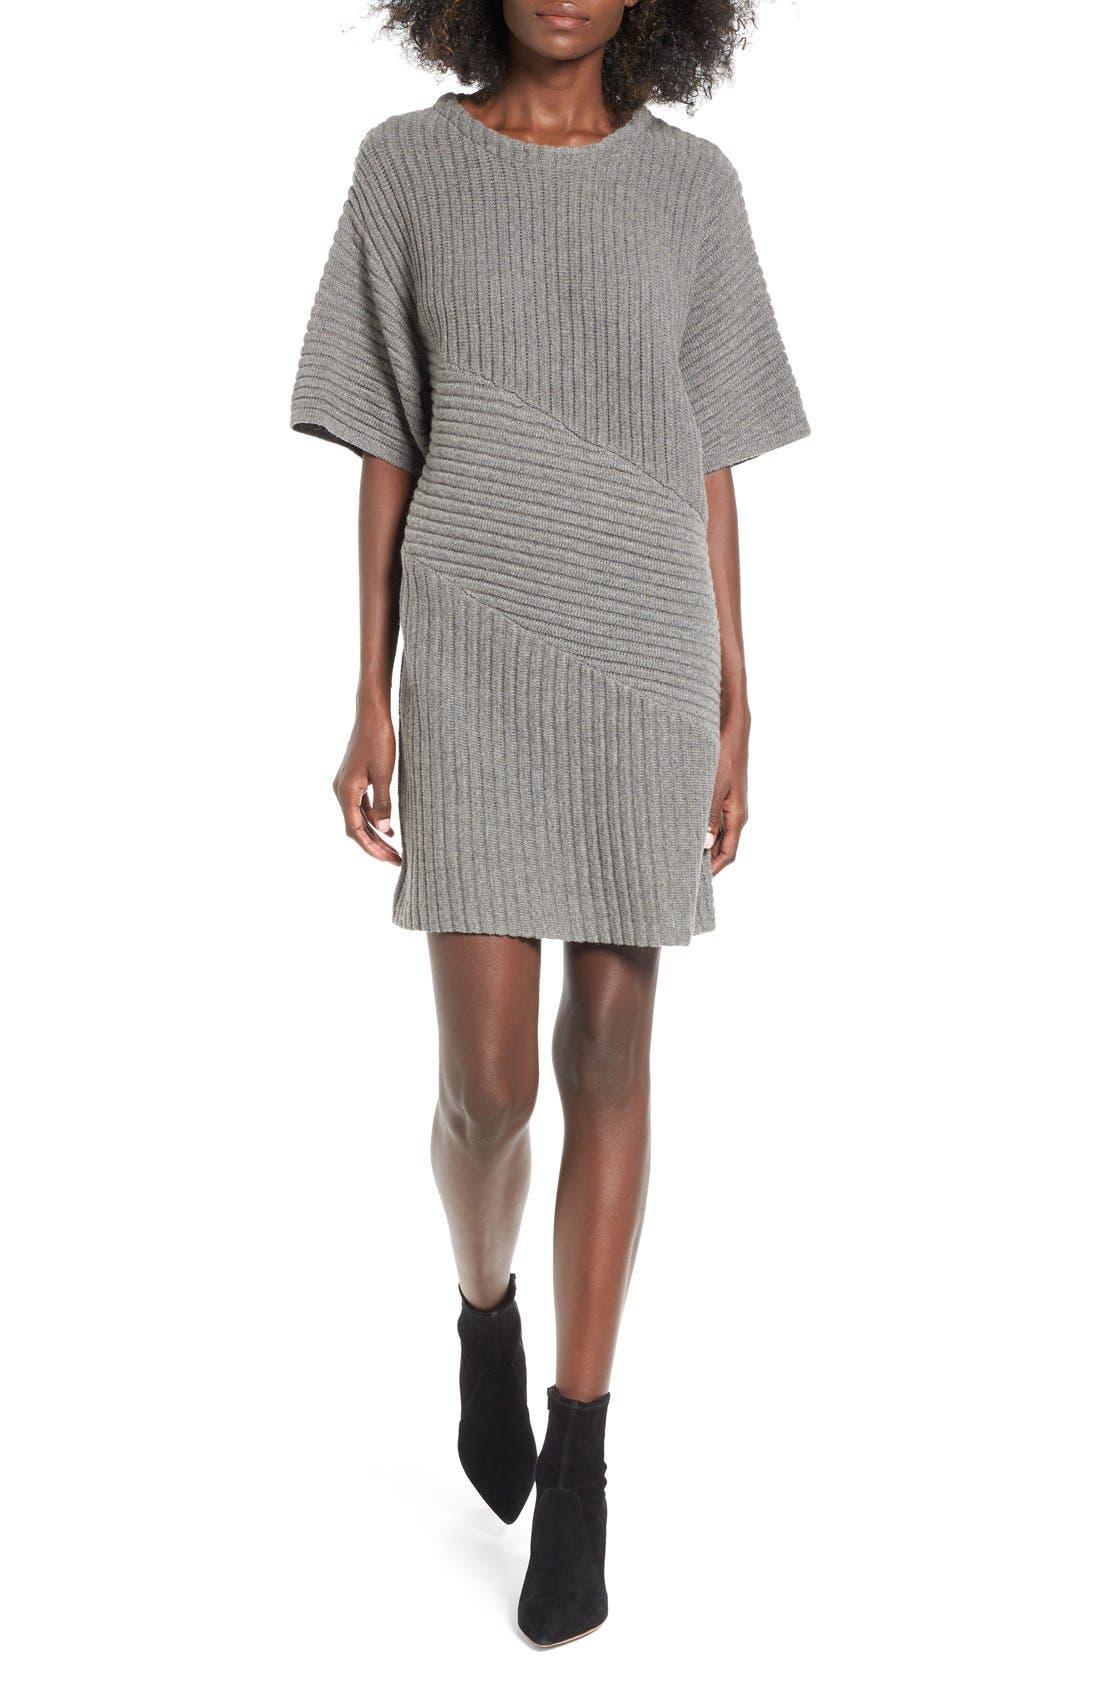 Alternate Image 1 Selected - ASTR Ribbed Sweater Dress